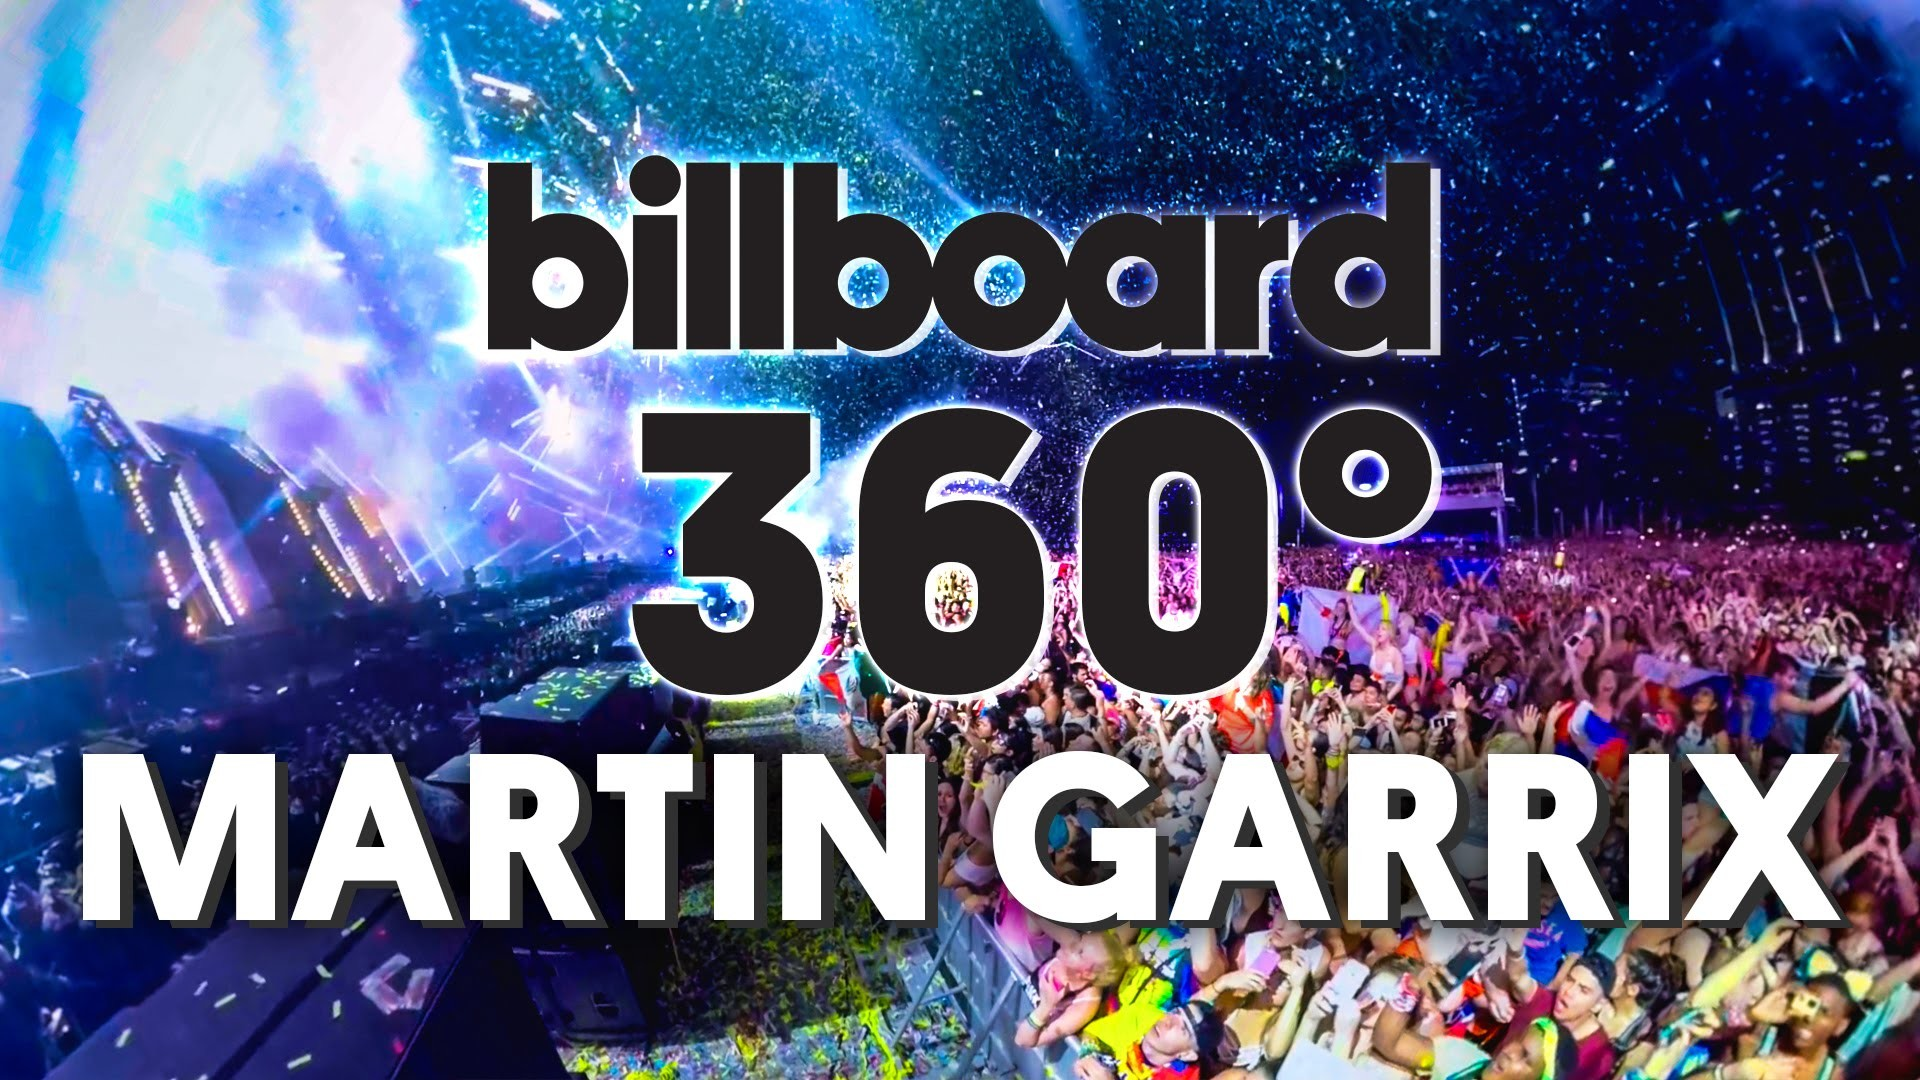 Martin Garrix @ Ultra Music Festival 2016, Miami | 360 VIDEO VR experience  – YouTube